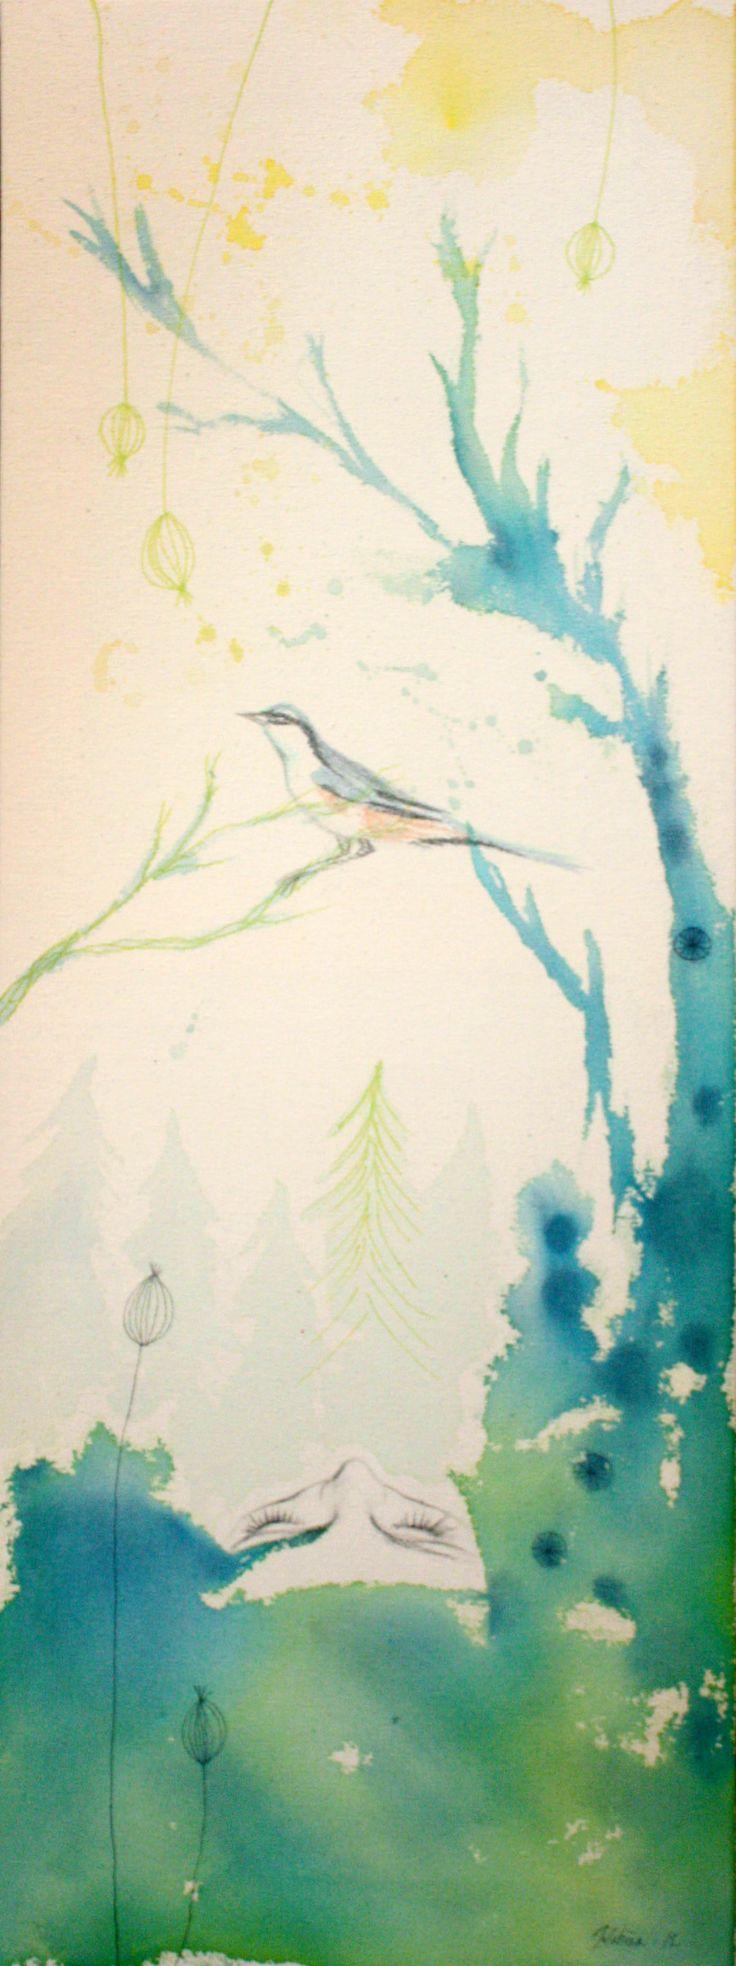 Kevät 2012 (Spring) Acrylic, pencil, marker on cotton duck